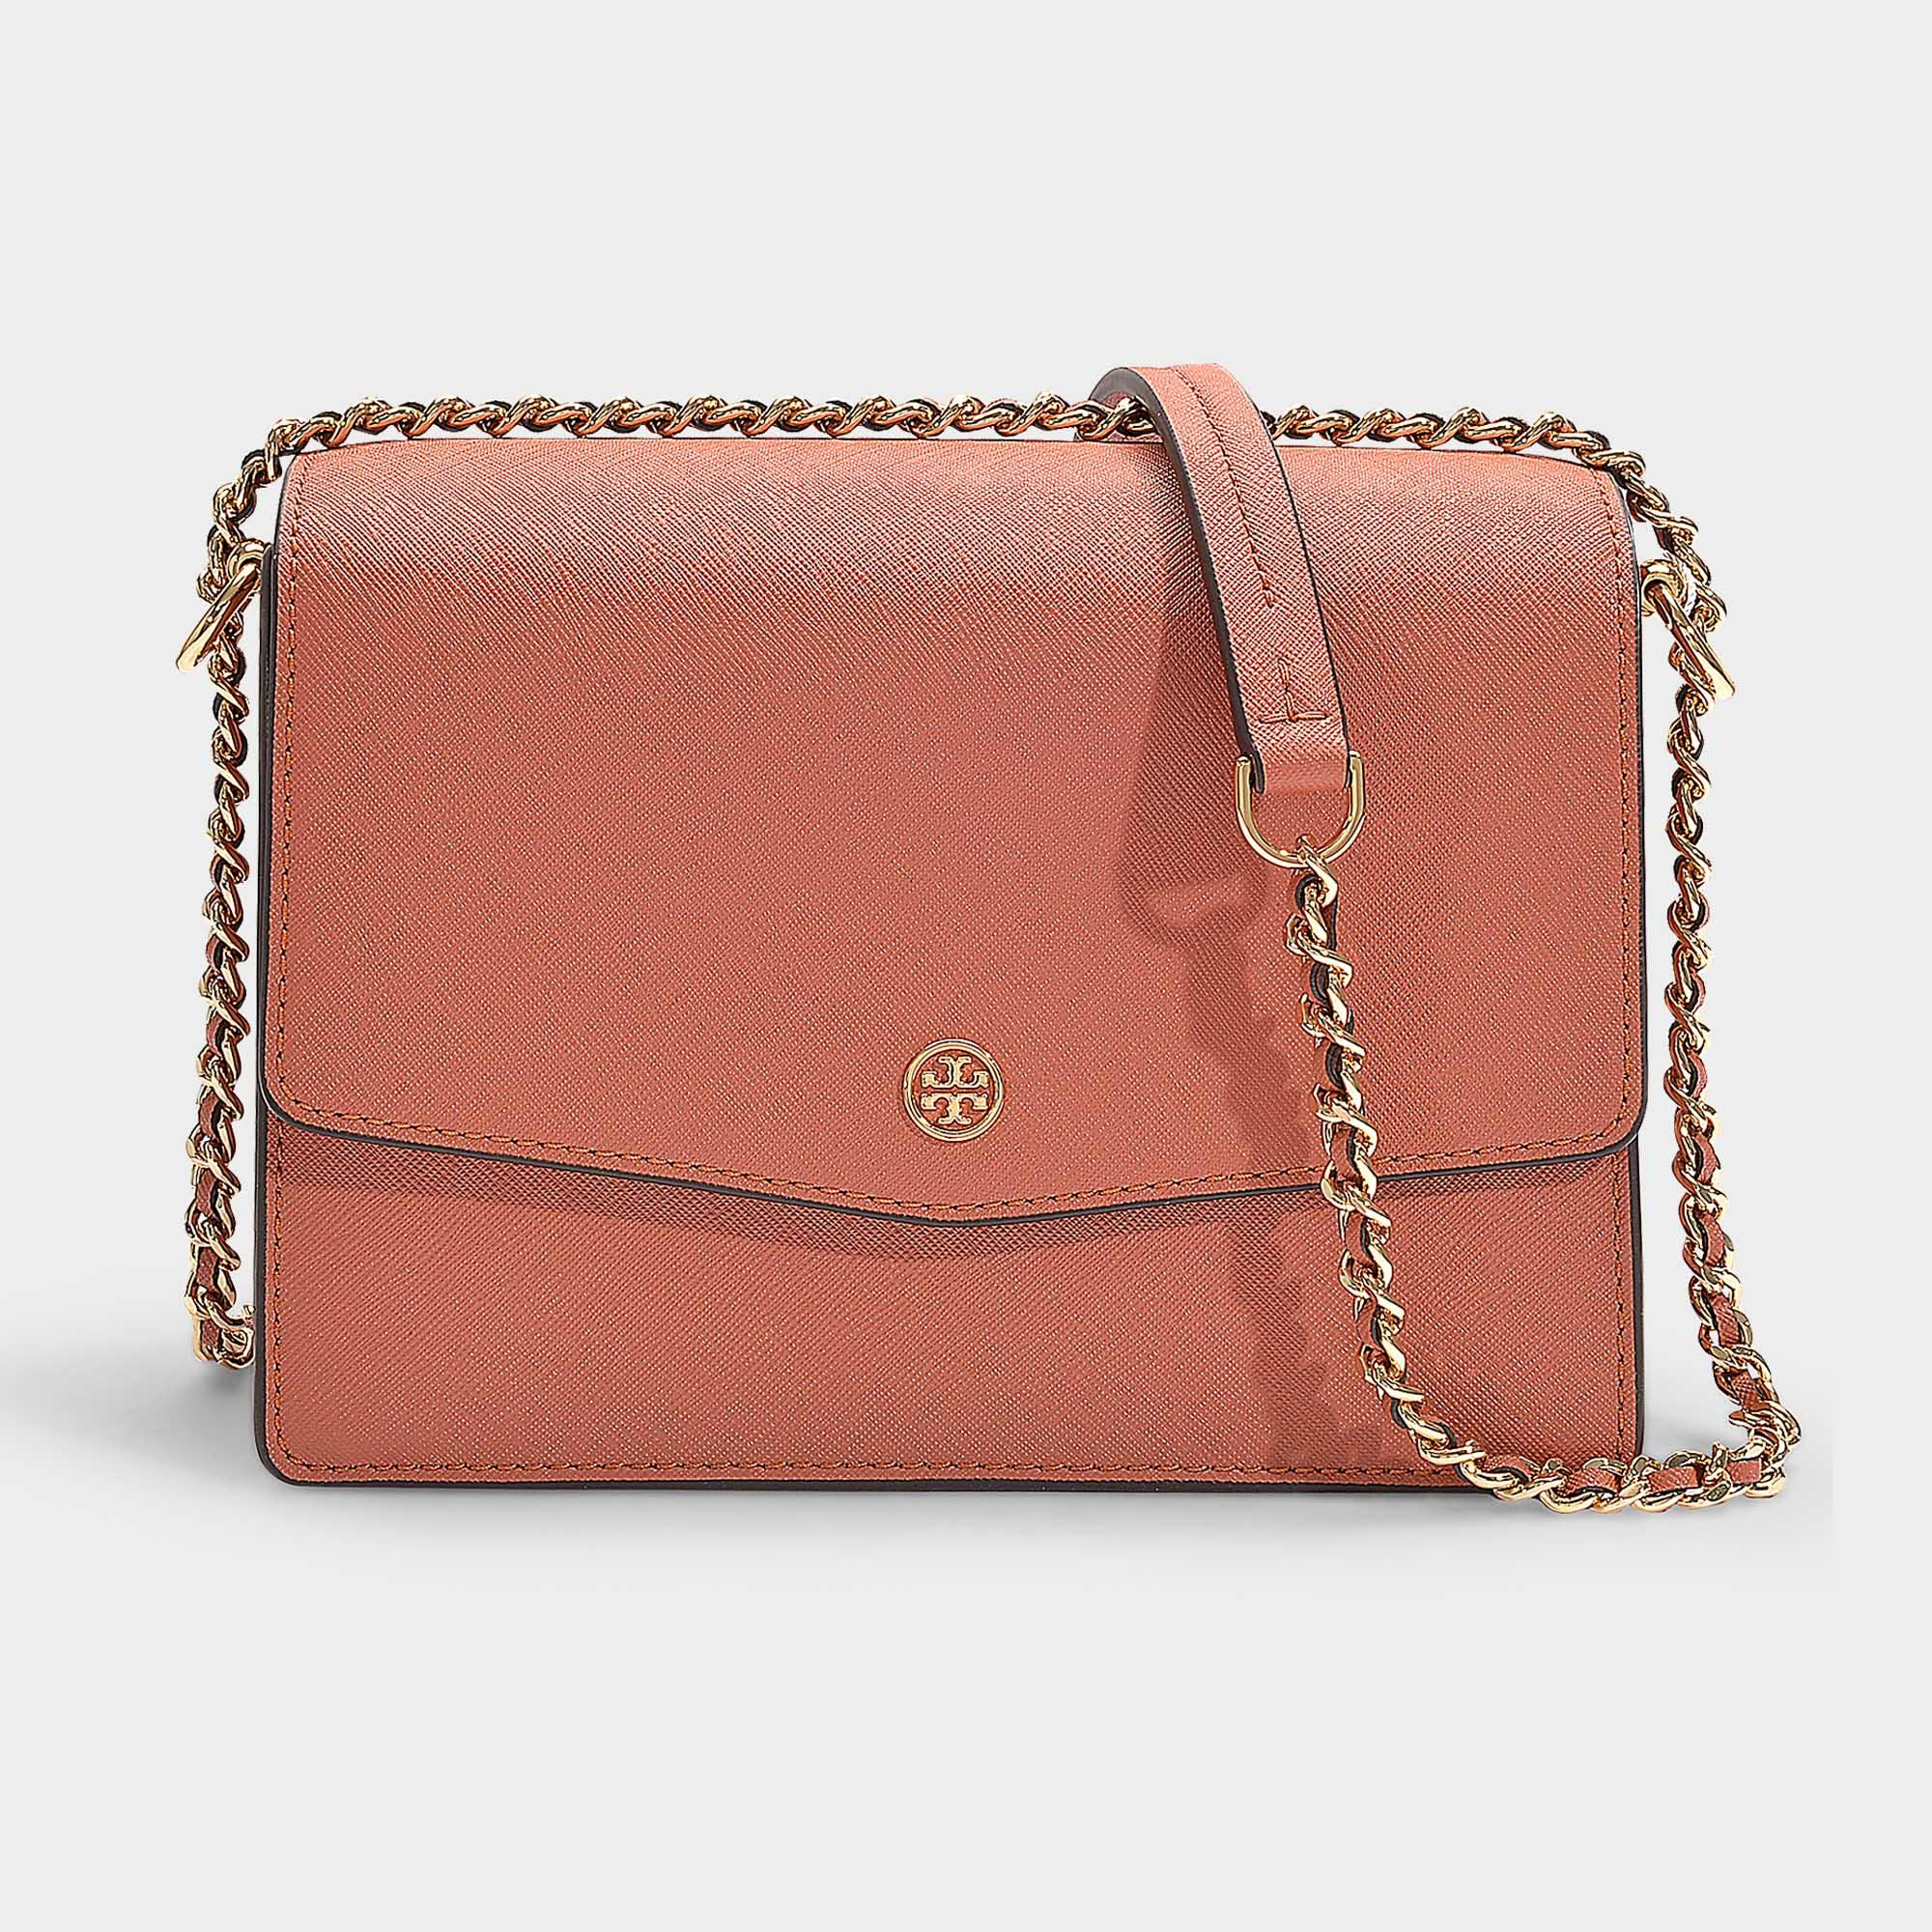 c5d06c71d081 Tory Burch. Women s Pink Robinson Convertible Shoulder Bag In Tramonto  Calfskin